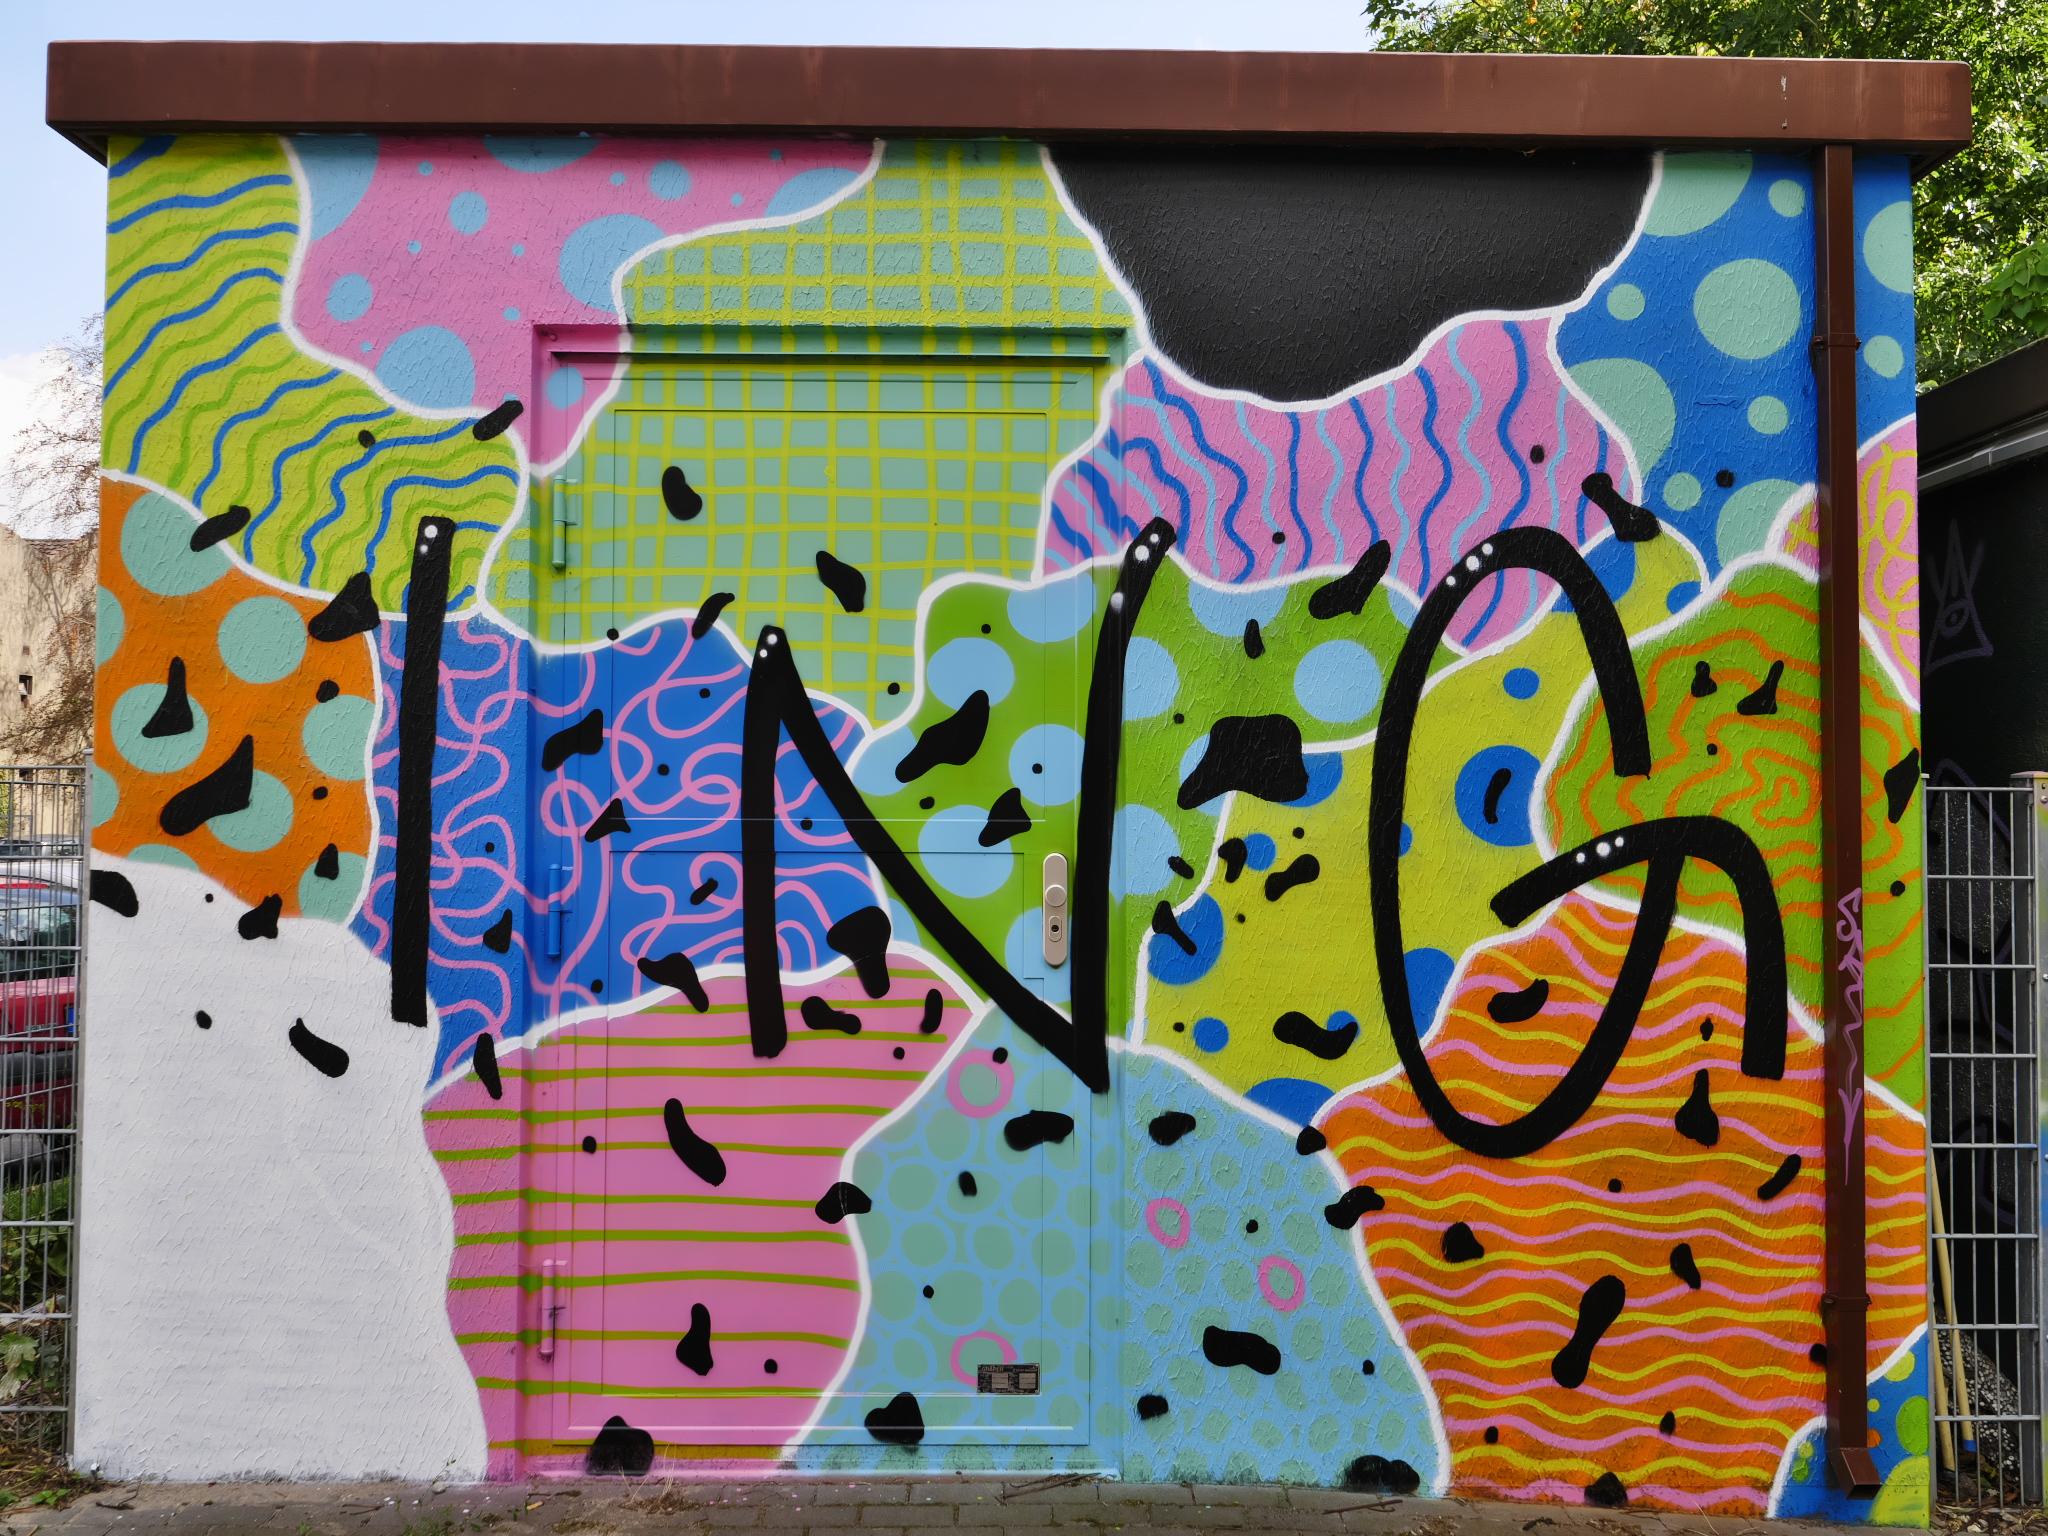 jugendkulturjahr-2020-ratingen-jkj2020-graffiti-trafohaeuschen-stadtwerke-Bild04